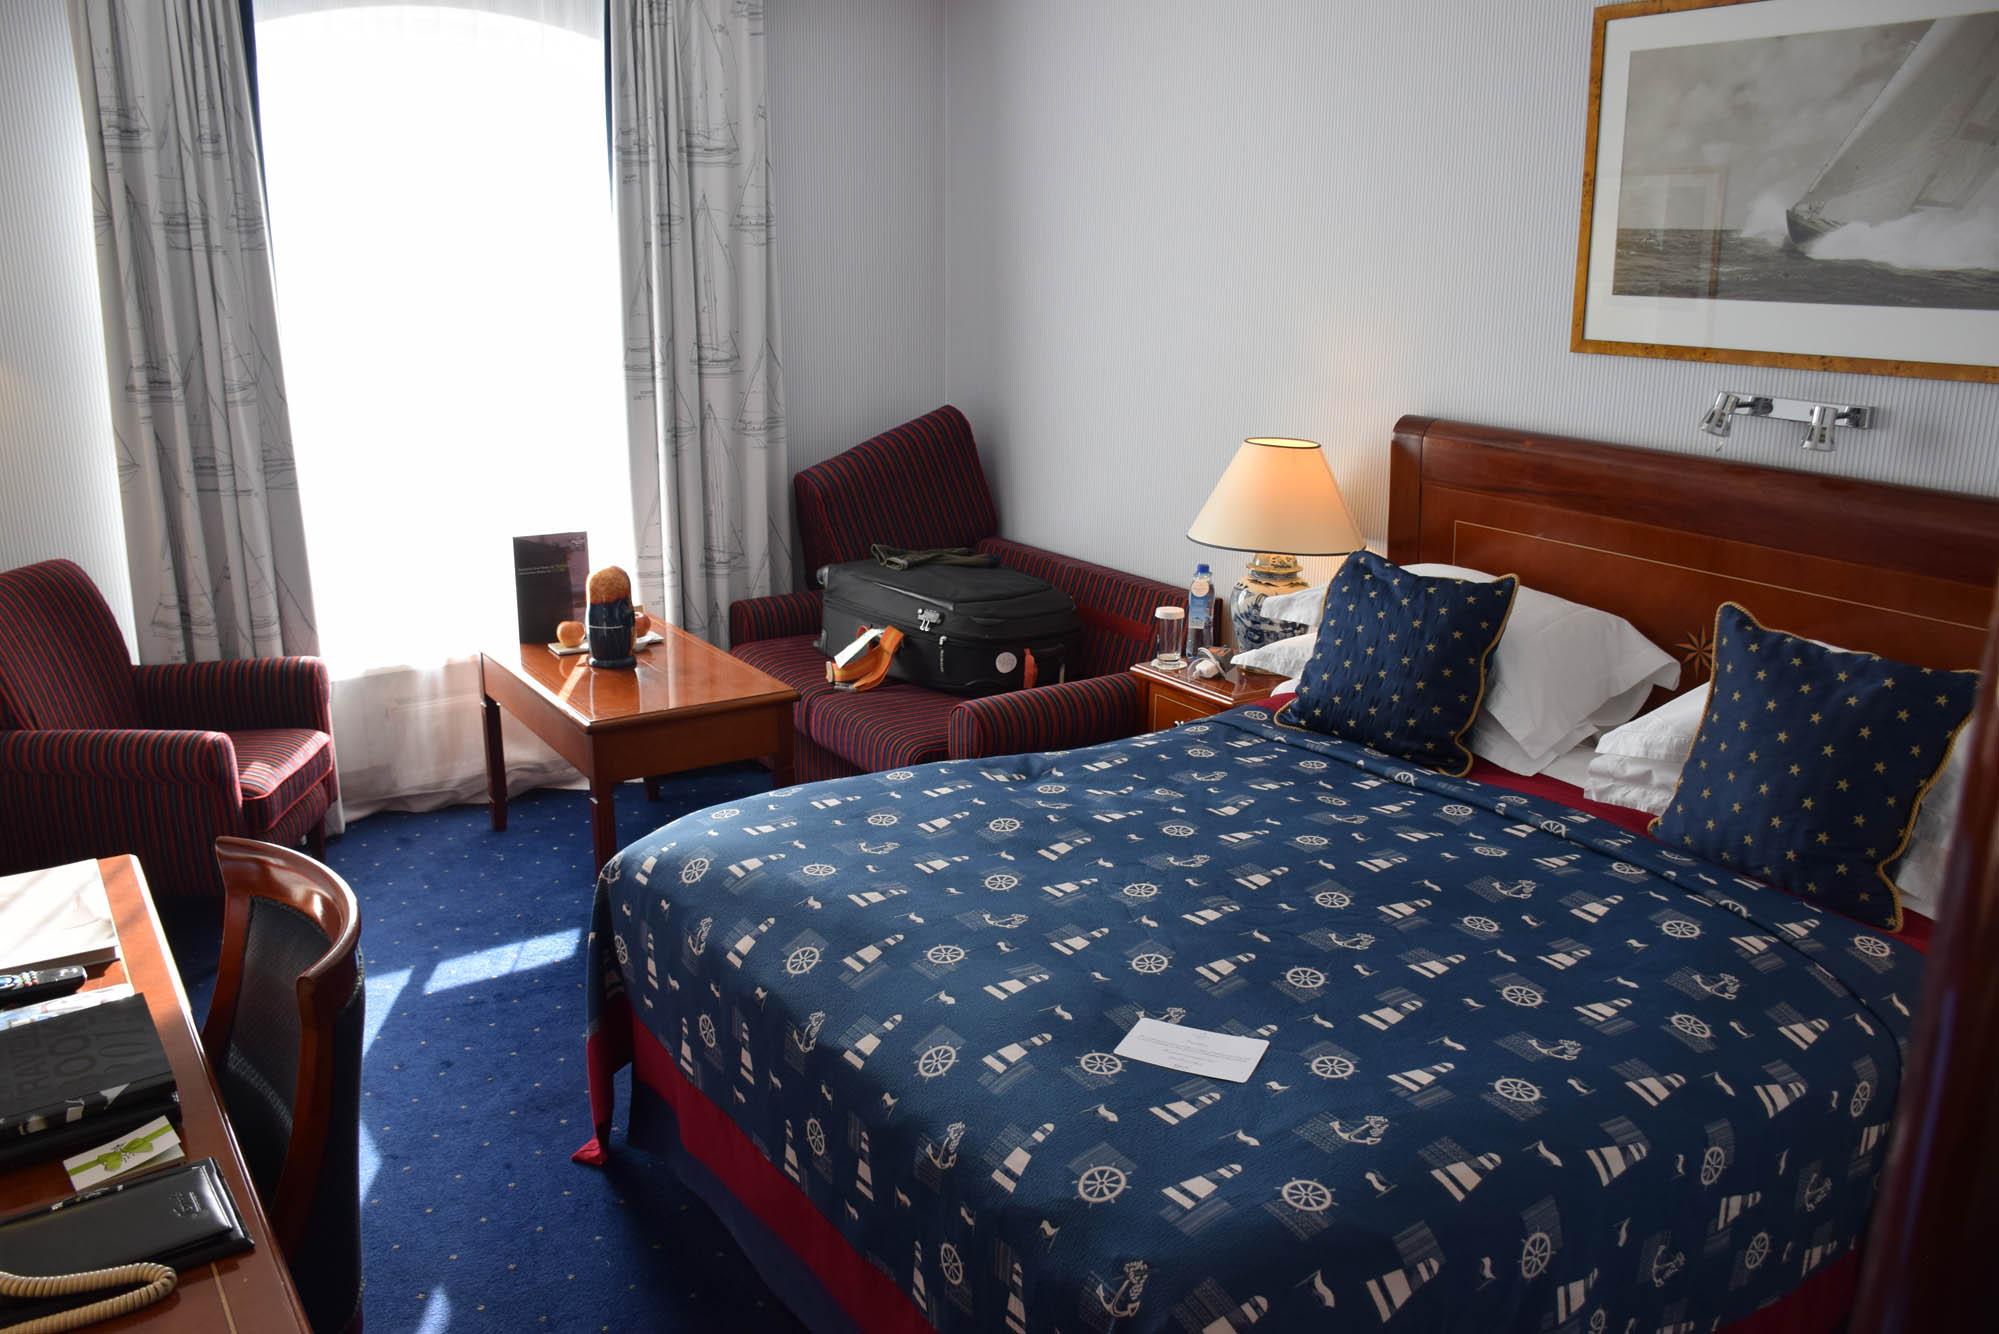 Kempinski Hotel Moika 22 ST PETERSBURG onde ficar hotéis russia